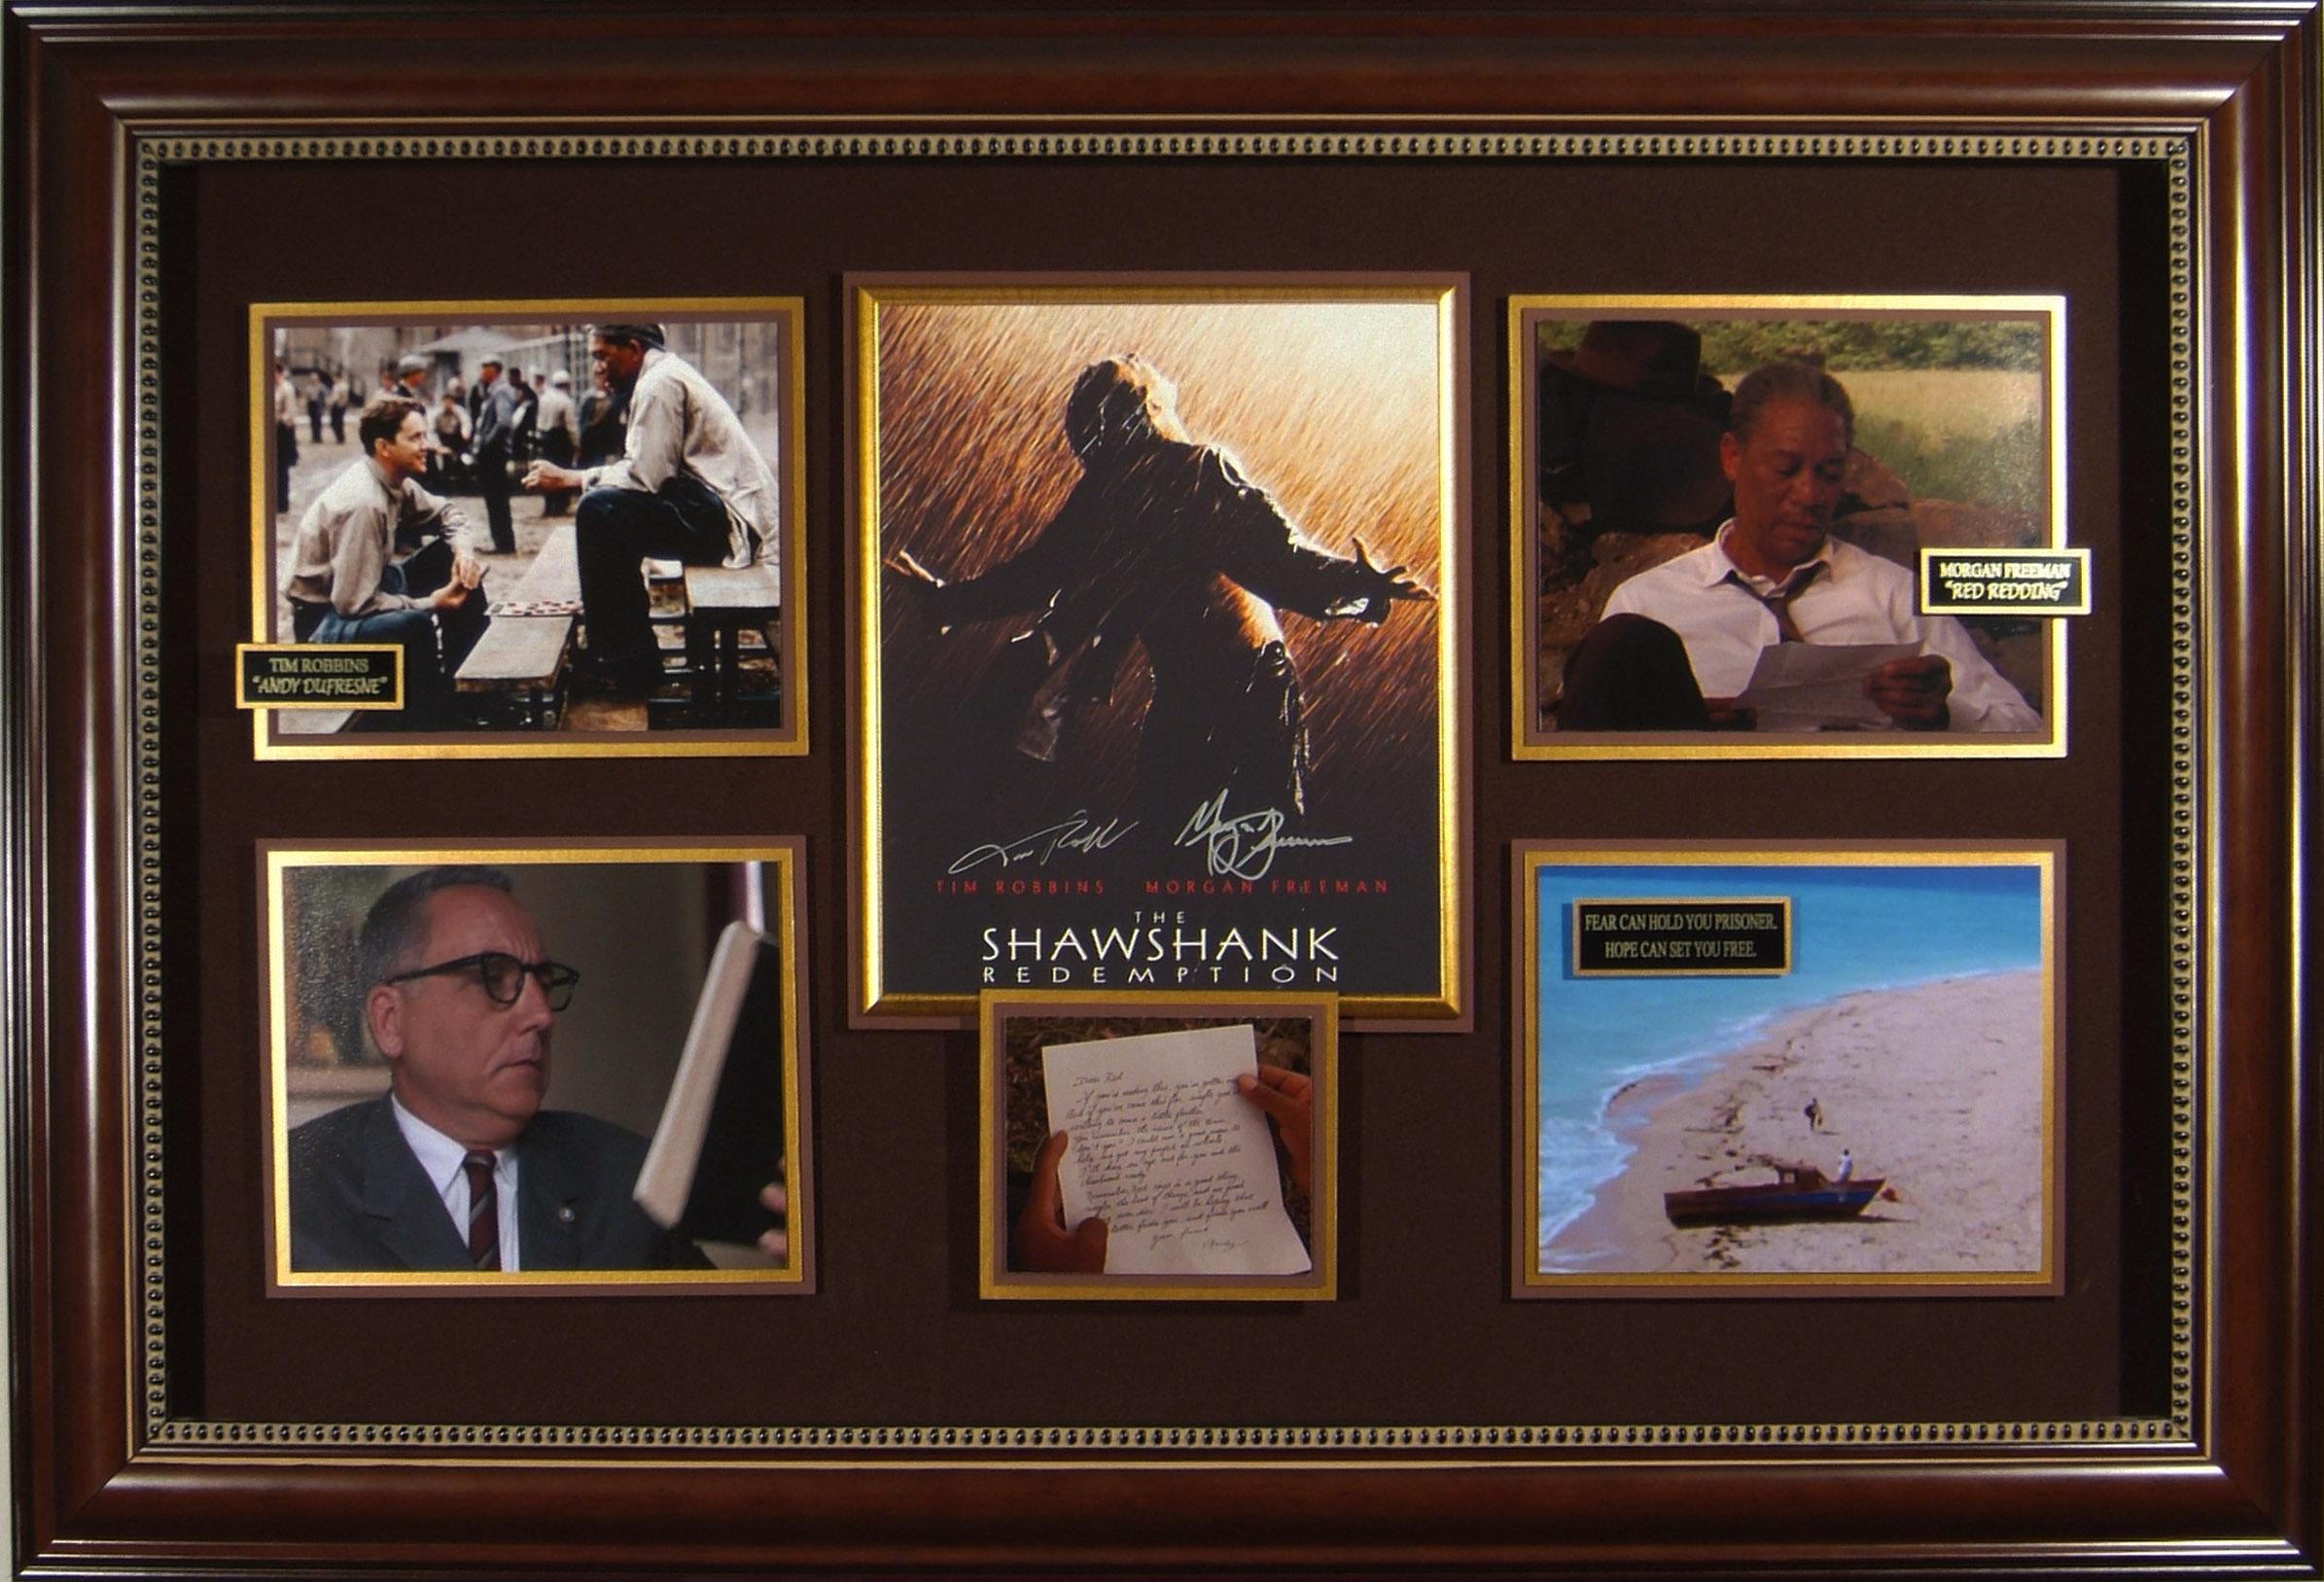 shawshank redemption cast autographed framed movie display